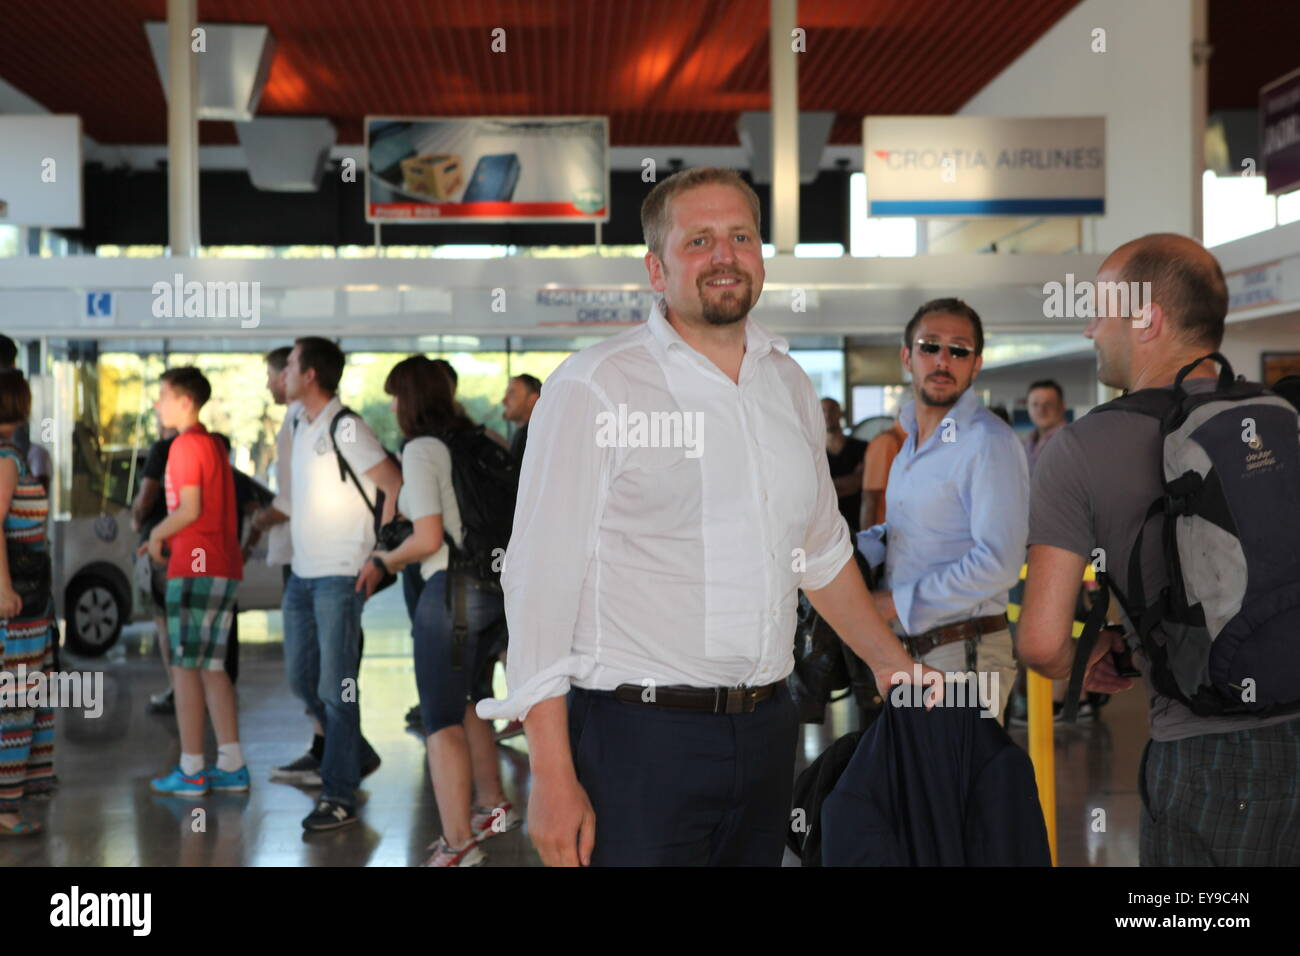 Liberland President Vit Jedlicka arrives at Osijek Airport, Croatia, July 2015 - Stock Image